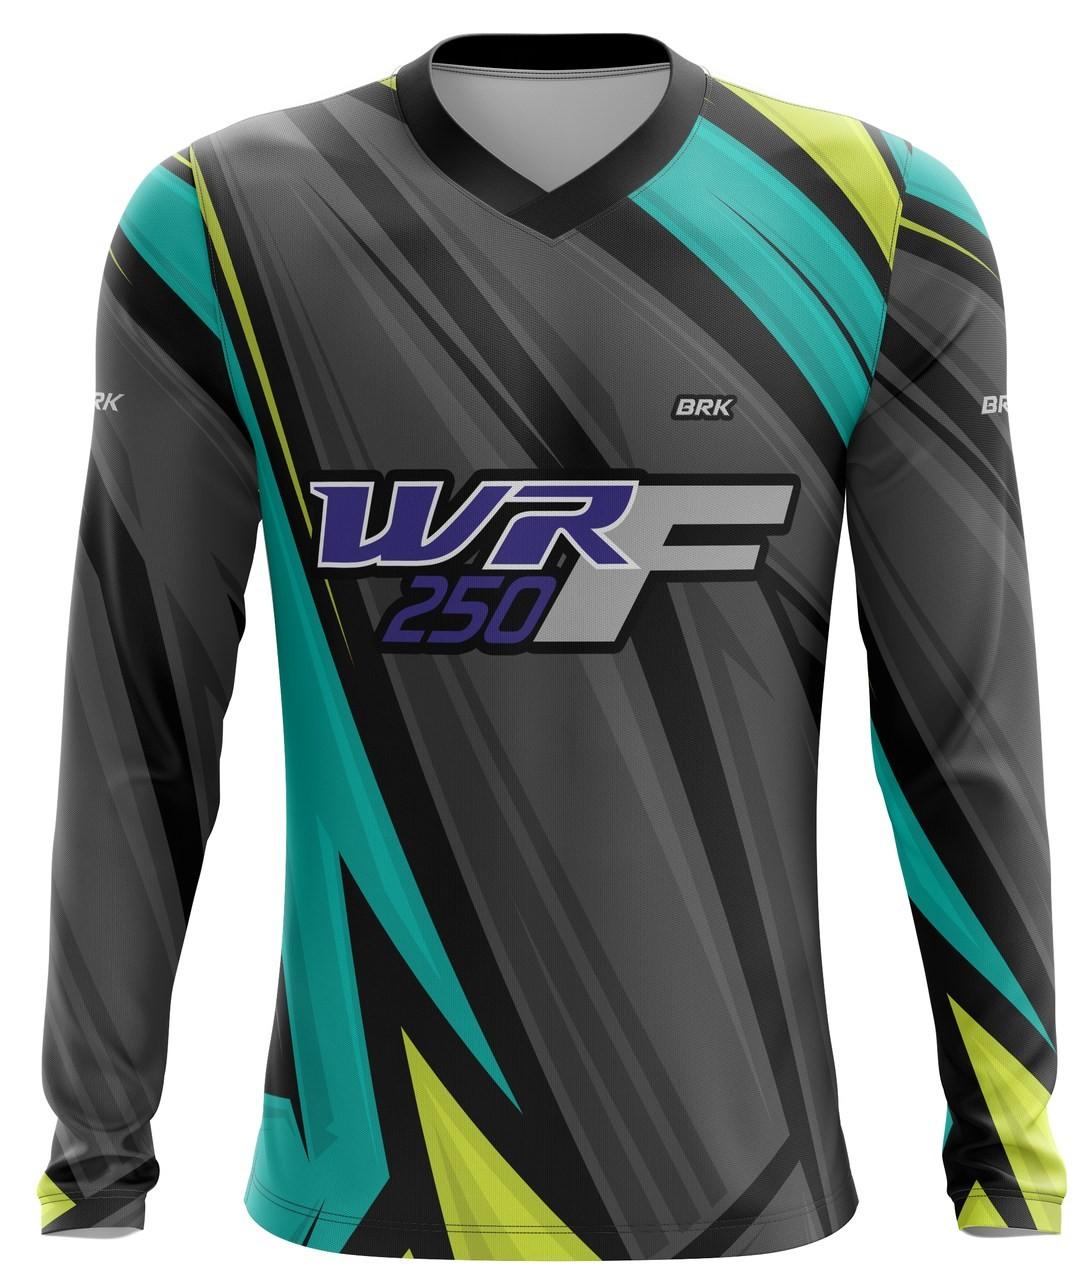 Camiseta Brk Motocross Yamaha WRF 250 com FPU 50+